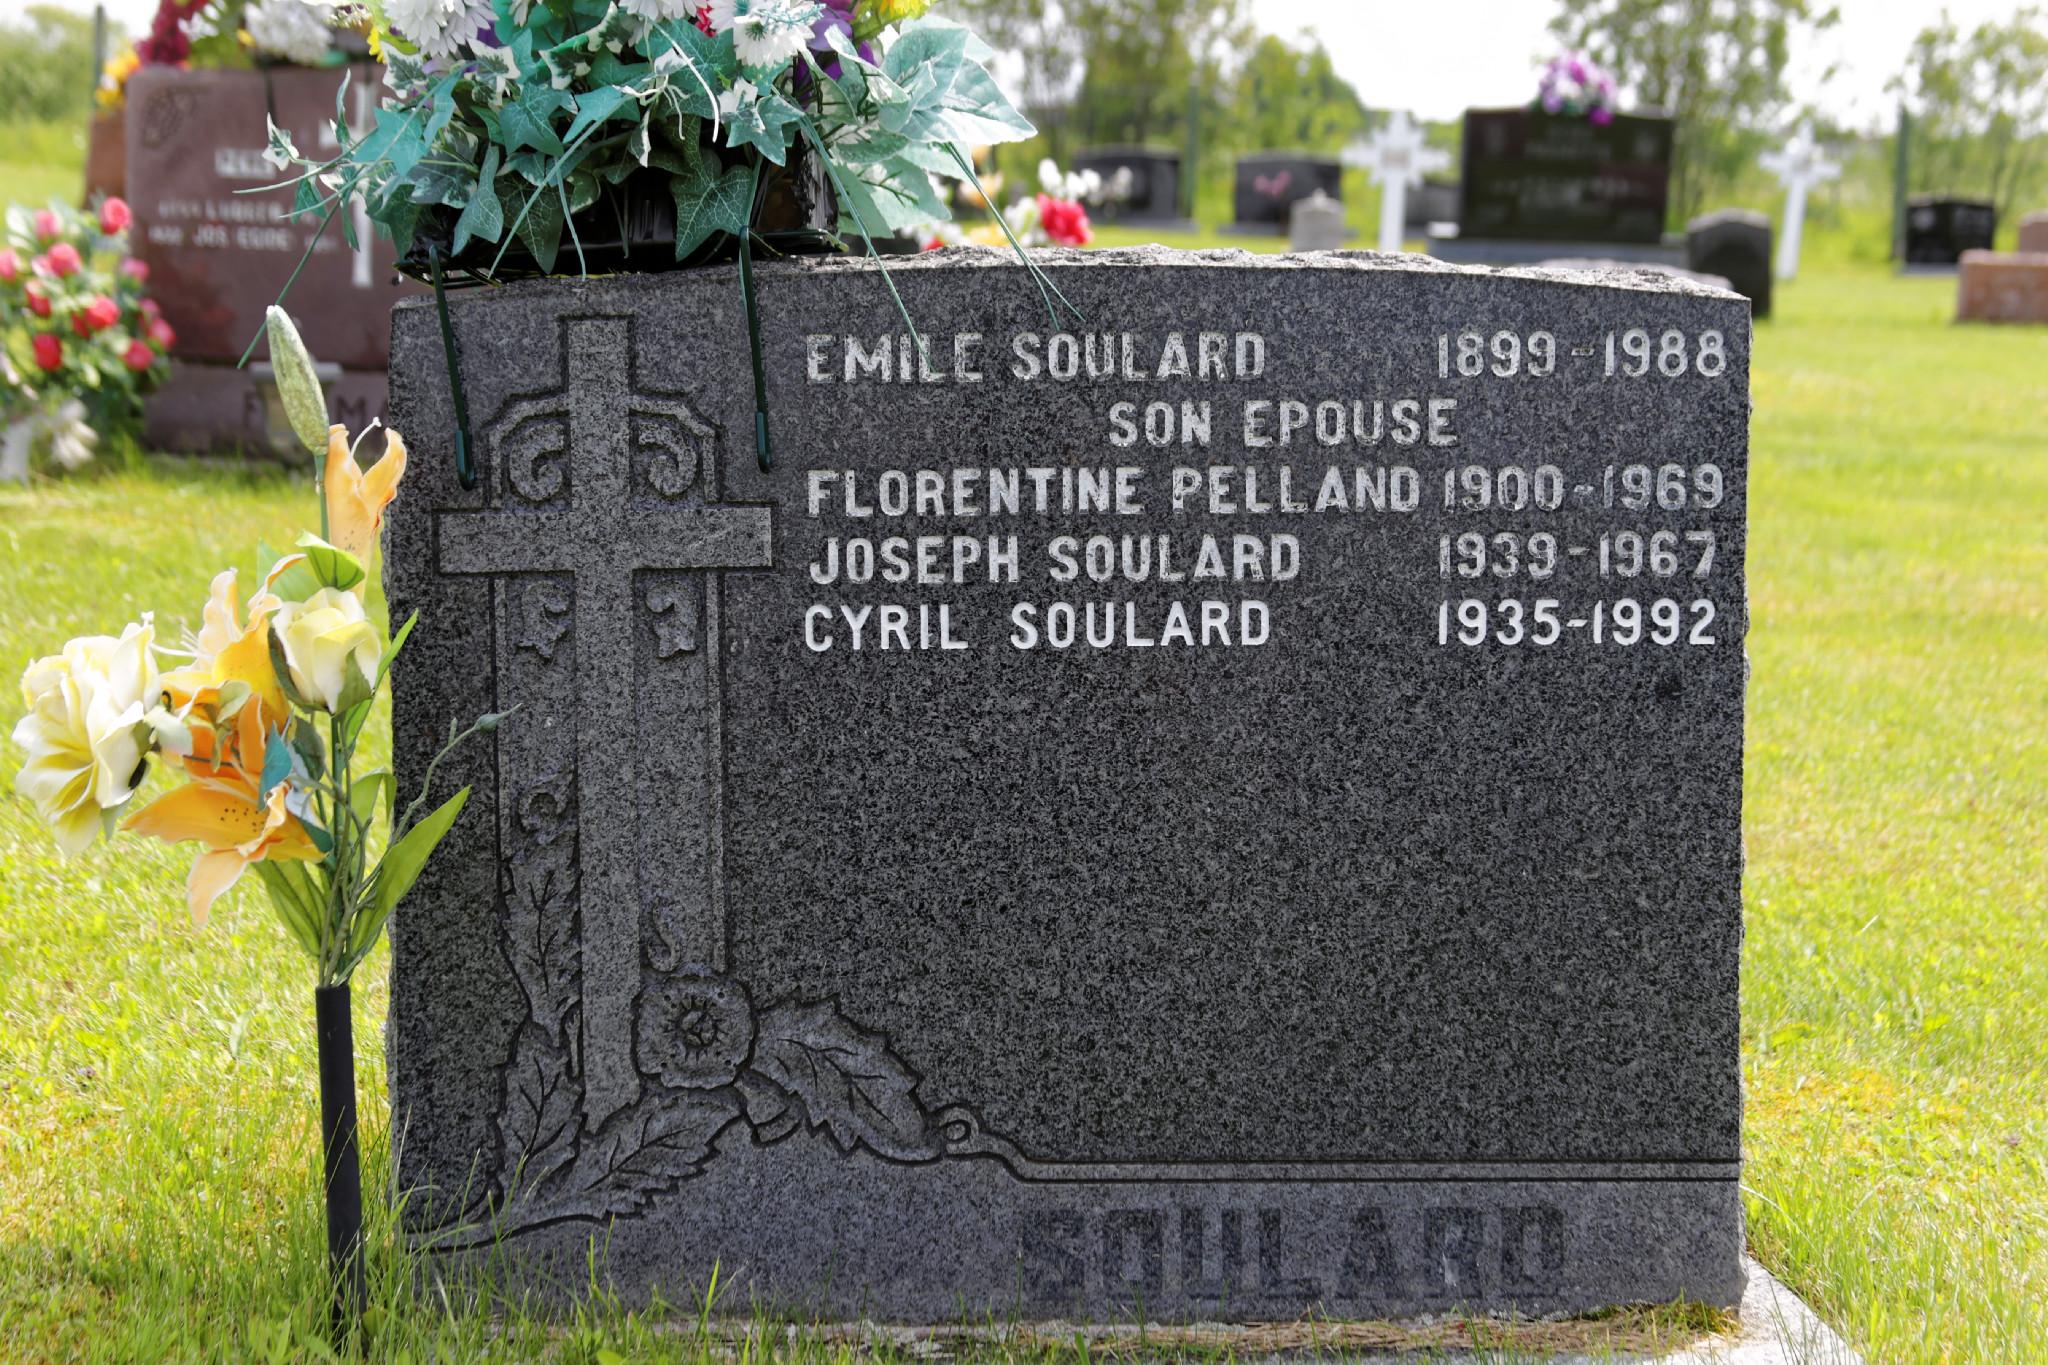 Émile Soulard